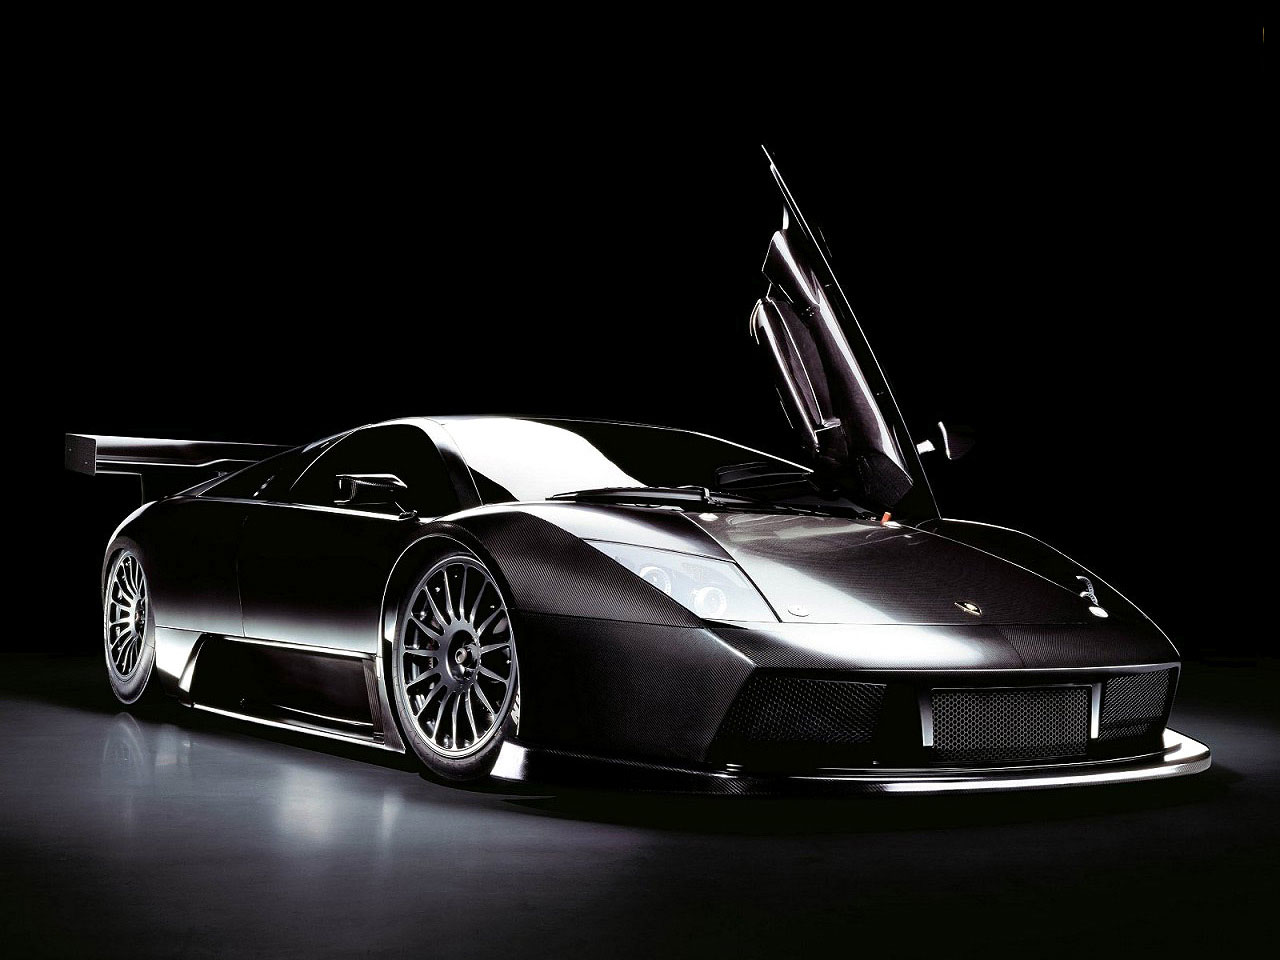 Black Lamborghini Wallpaper | CARS